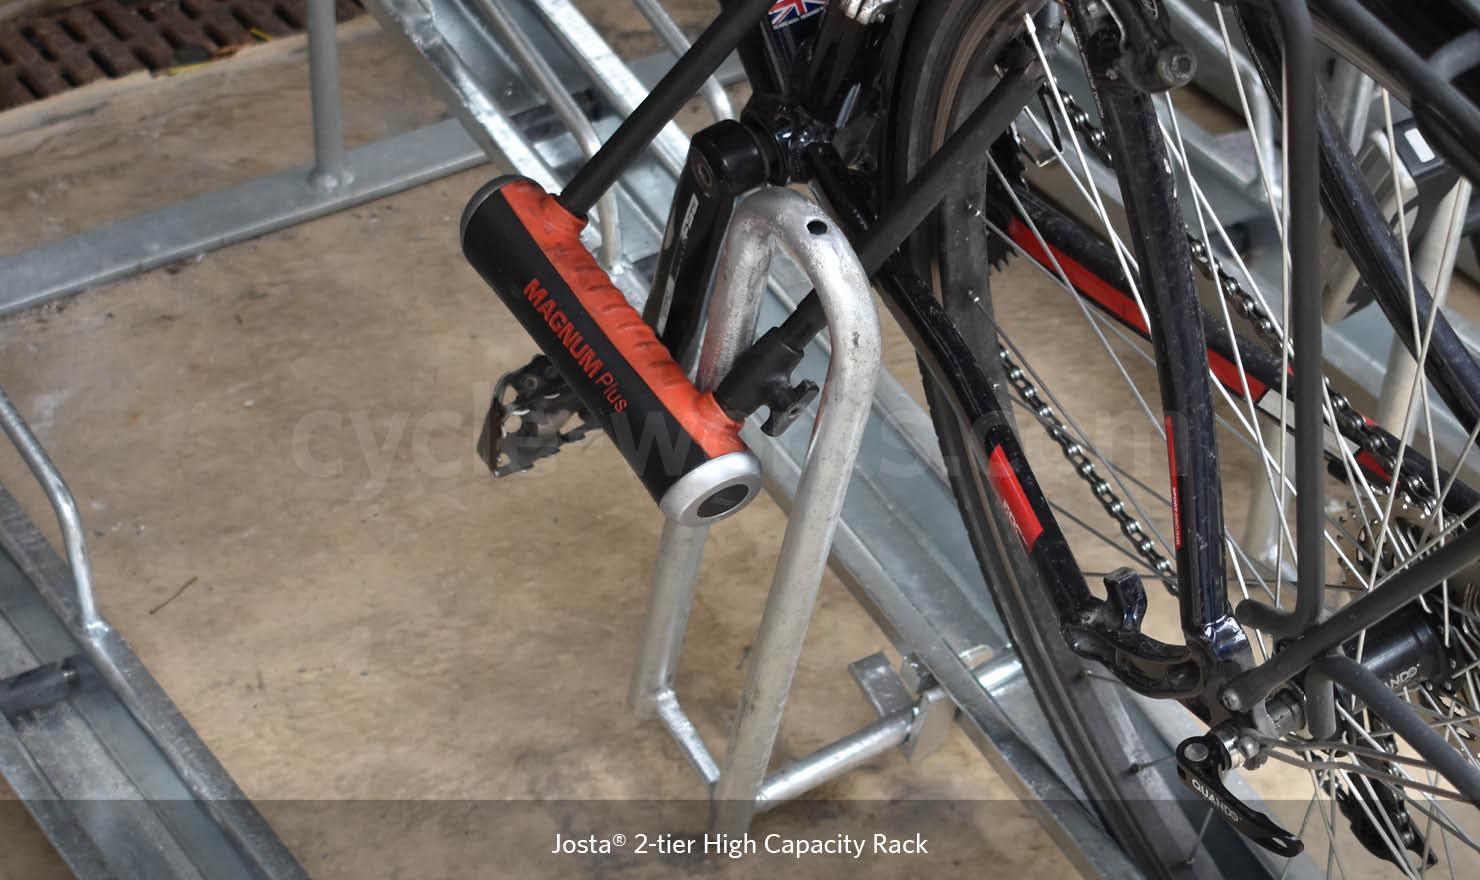 Josta® 2-tier Rack – Cycle Works